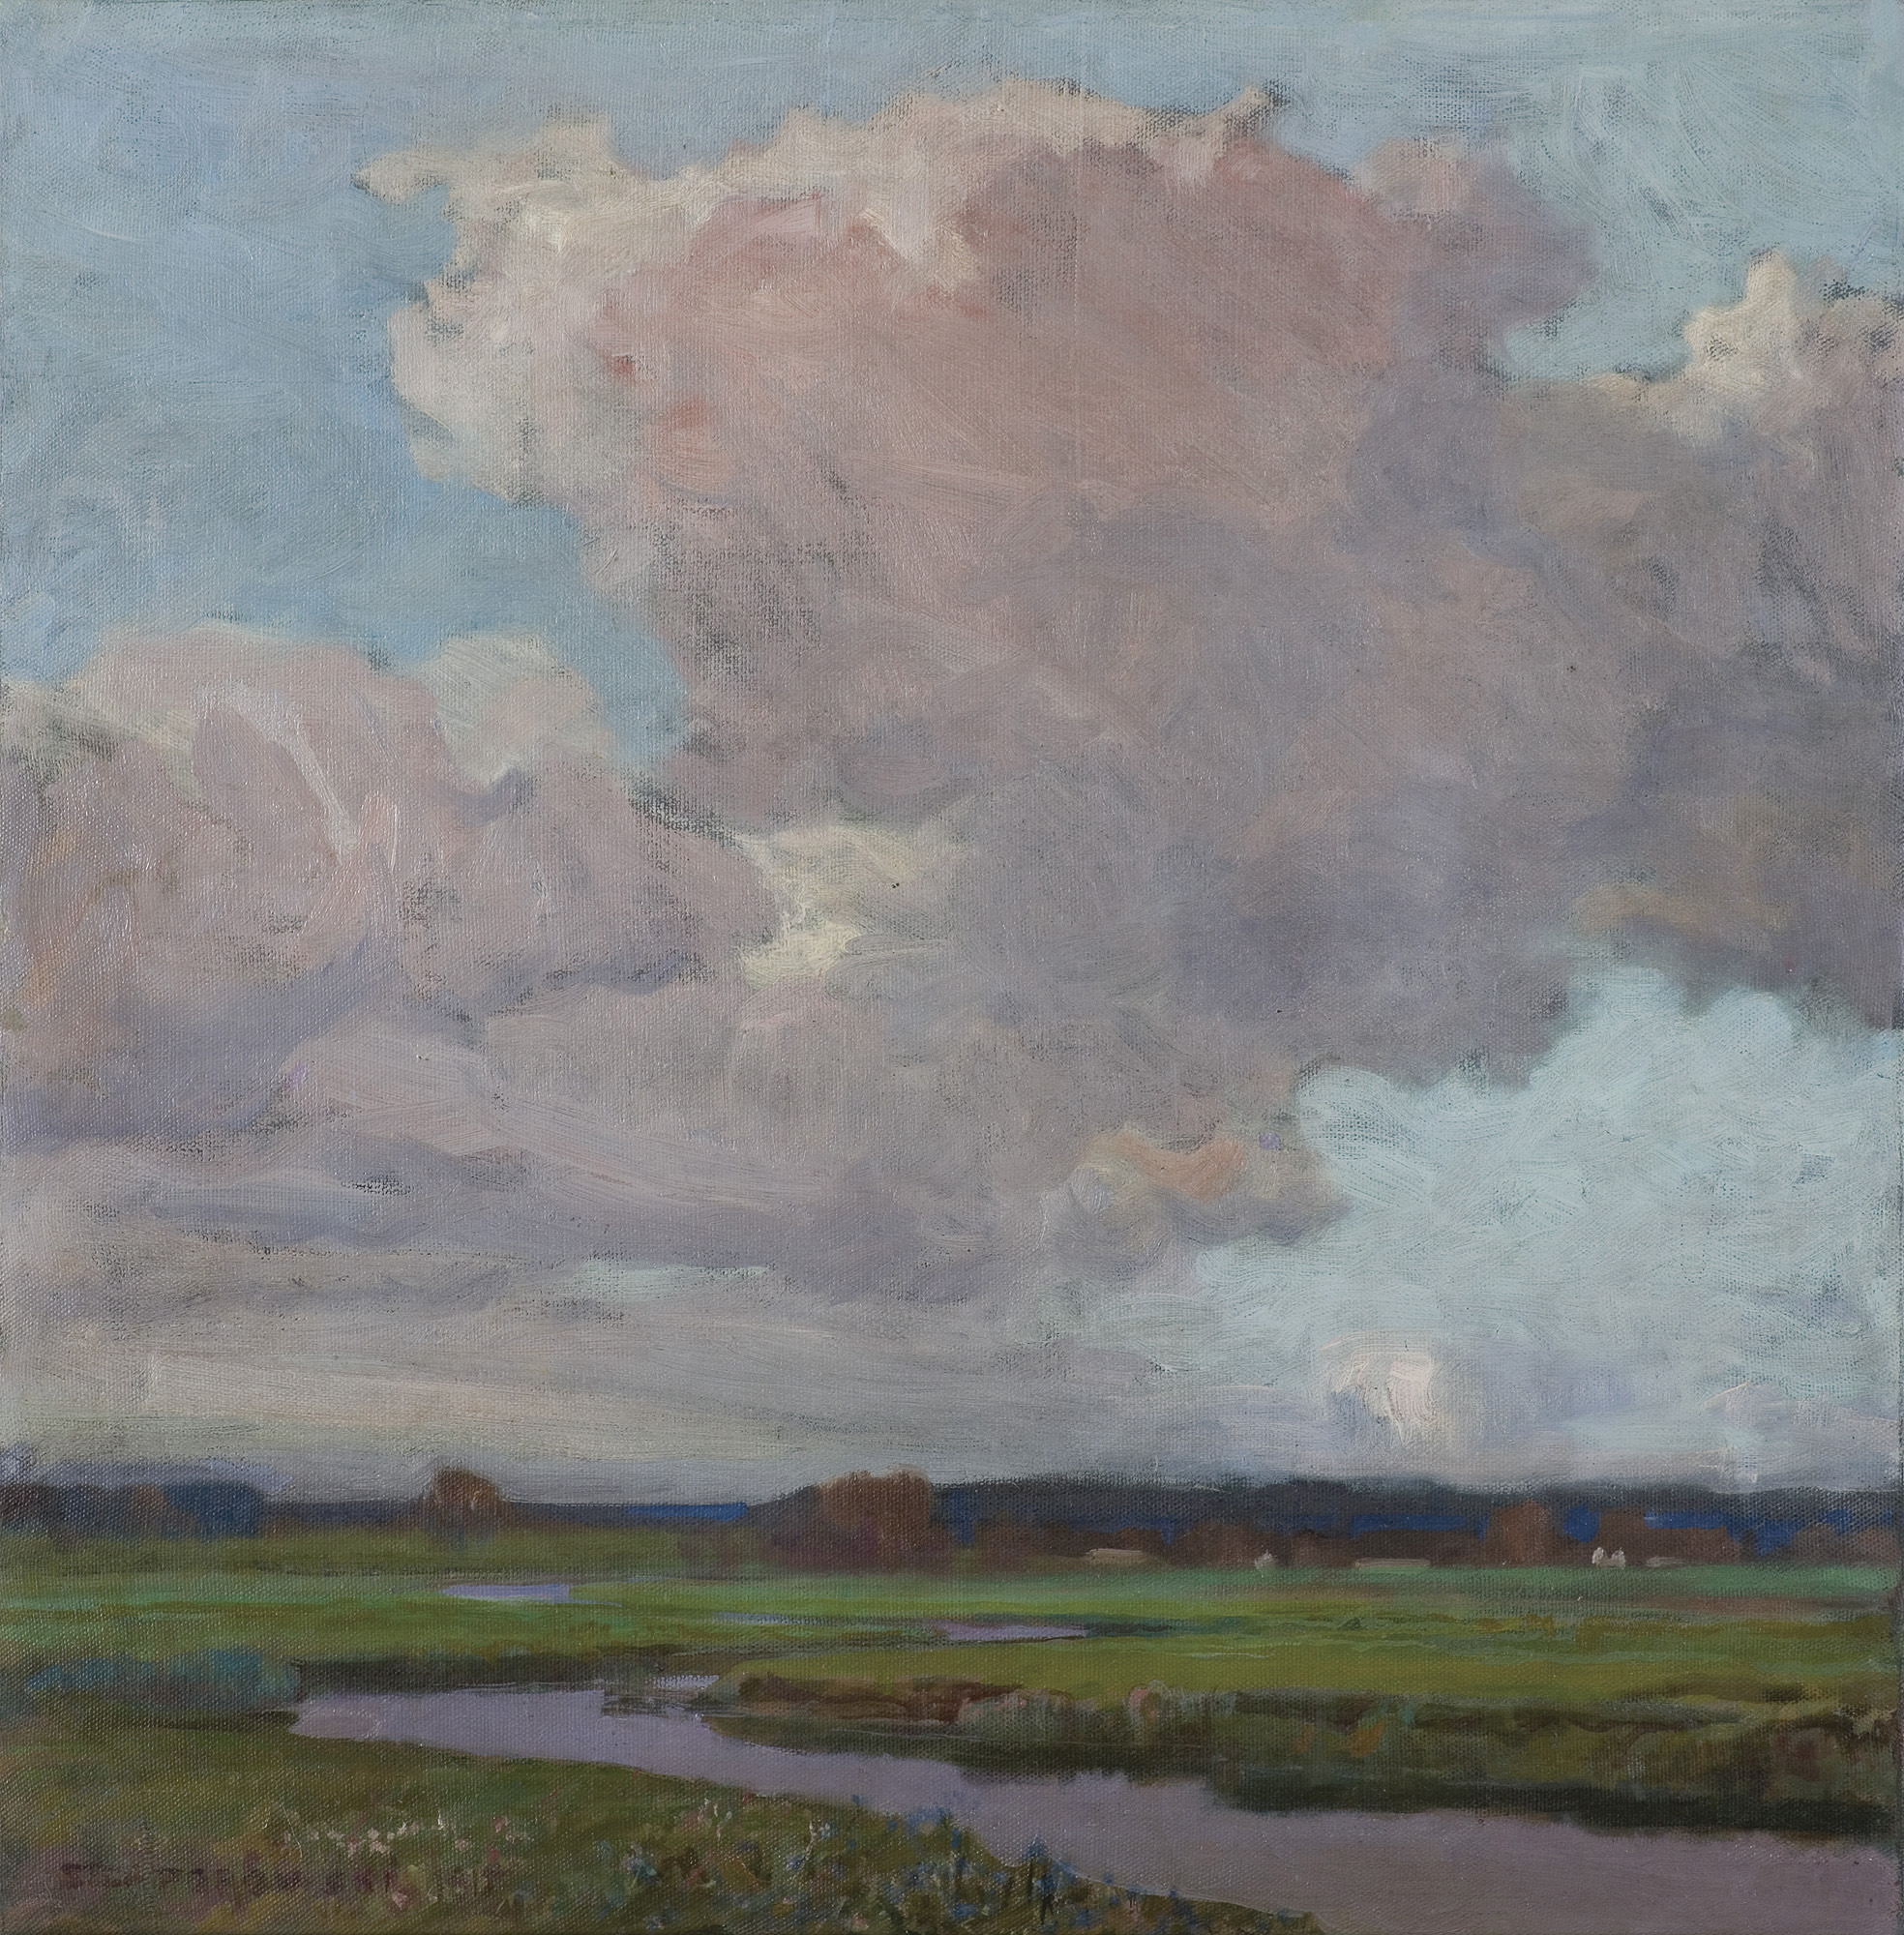 OBŁOKI, 1915